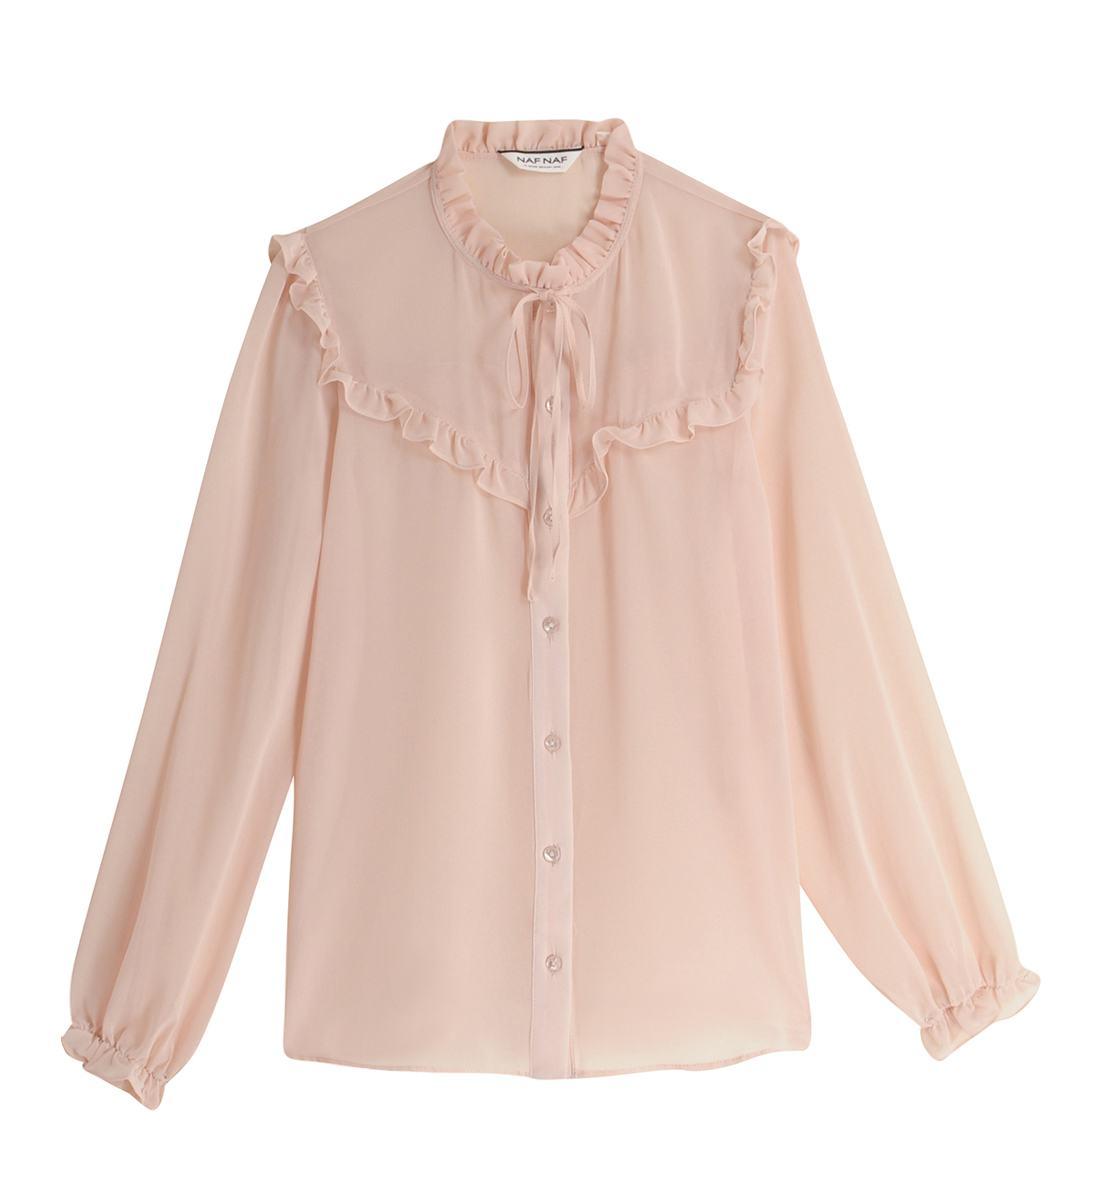 Chemise rose pale femme